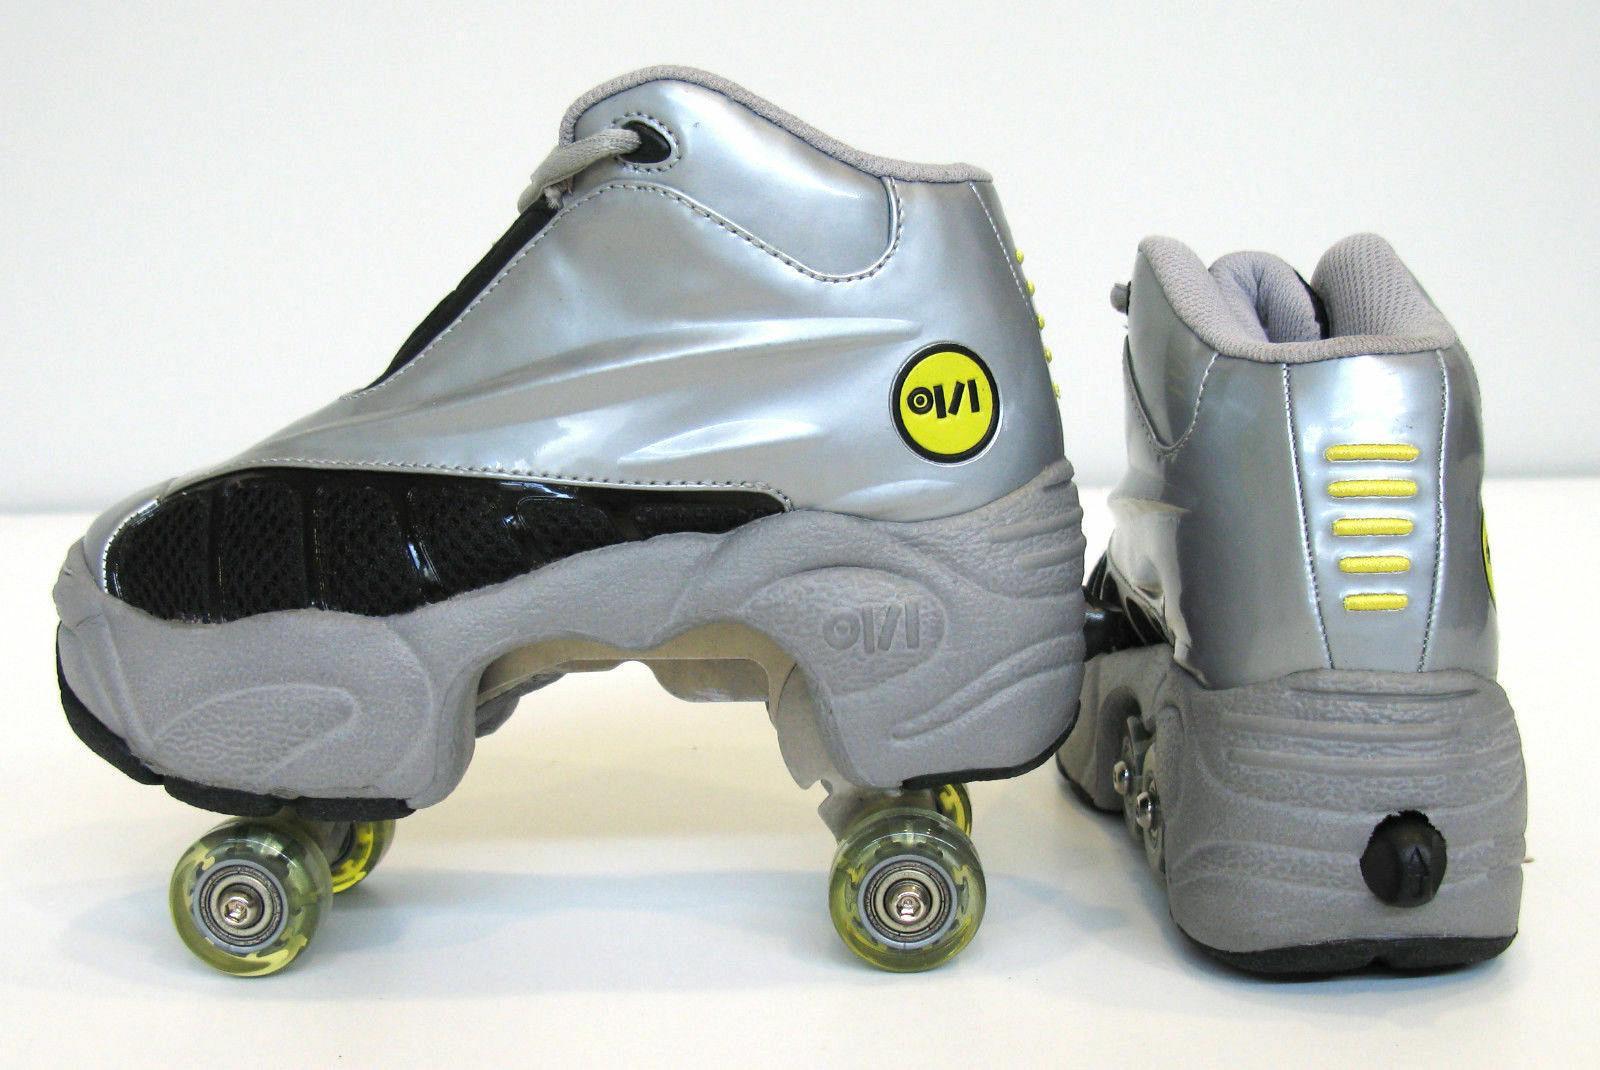 UNIQUE Quad ROLLER Skates Silver/Grey